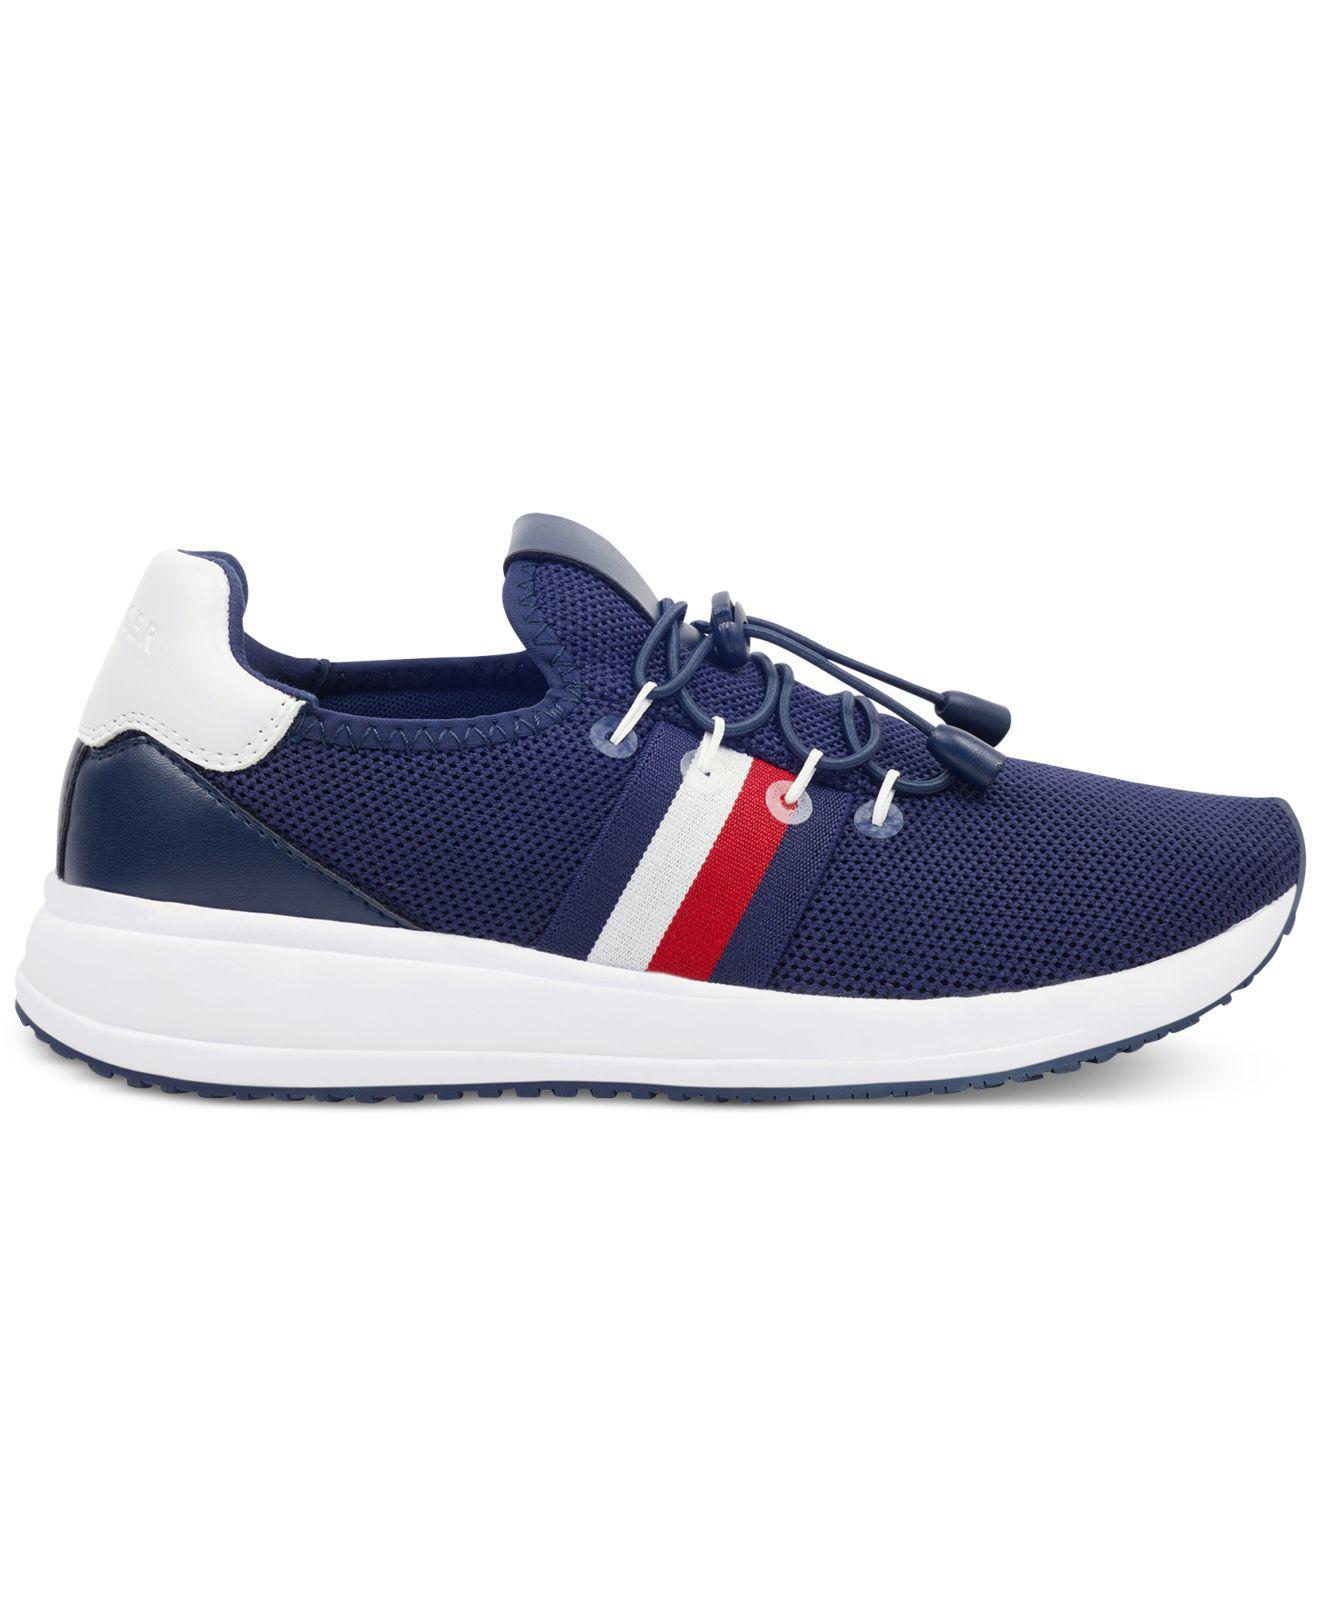 545ed688f38d Lyst - Tommy Hilfiger Rhena Sneakers in Blue